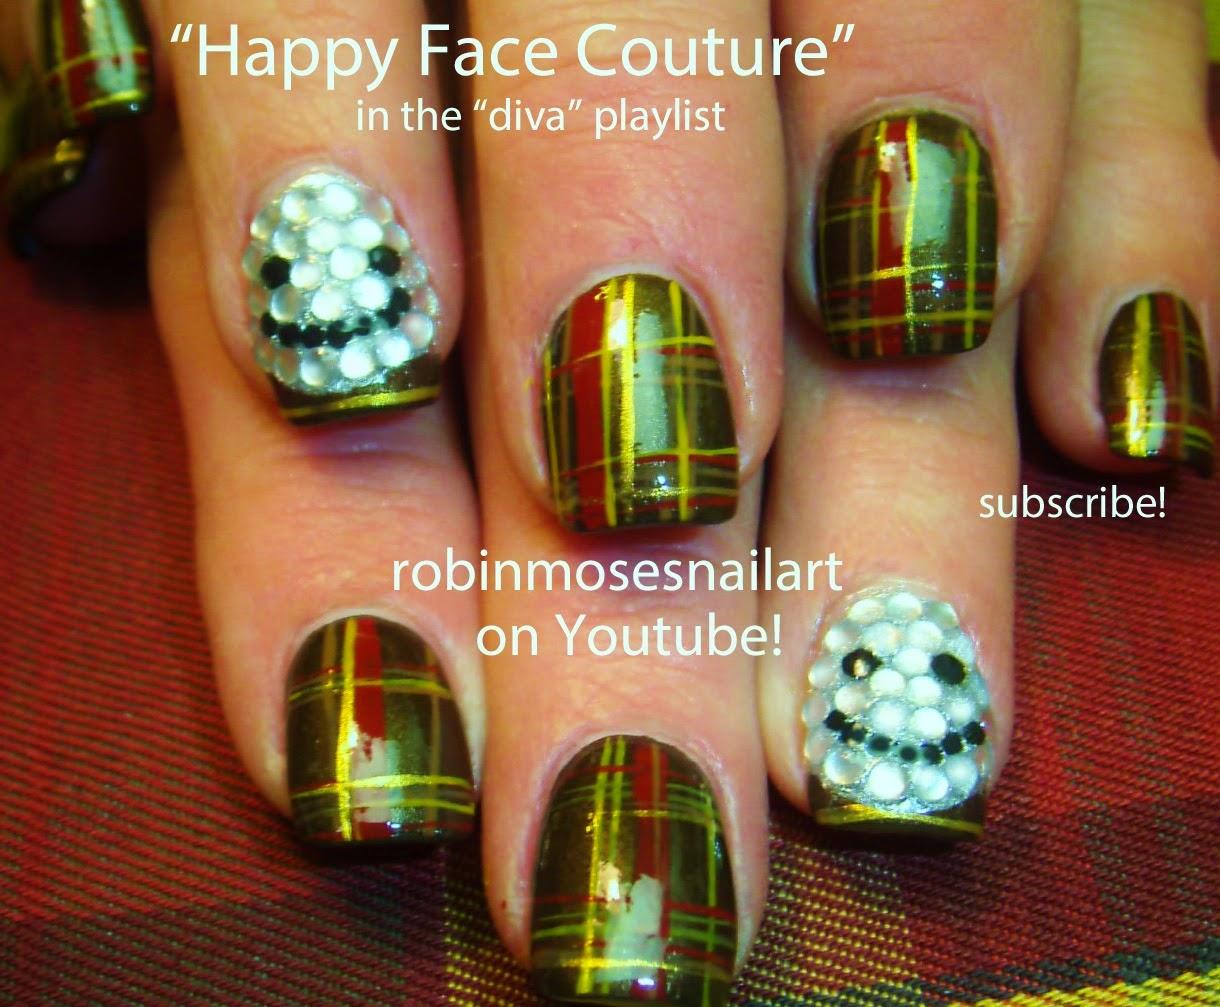 Robin moses nail art august 2014 nail art tutorials cute diy nail art tutorial designs prinsesfo Image collections